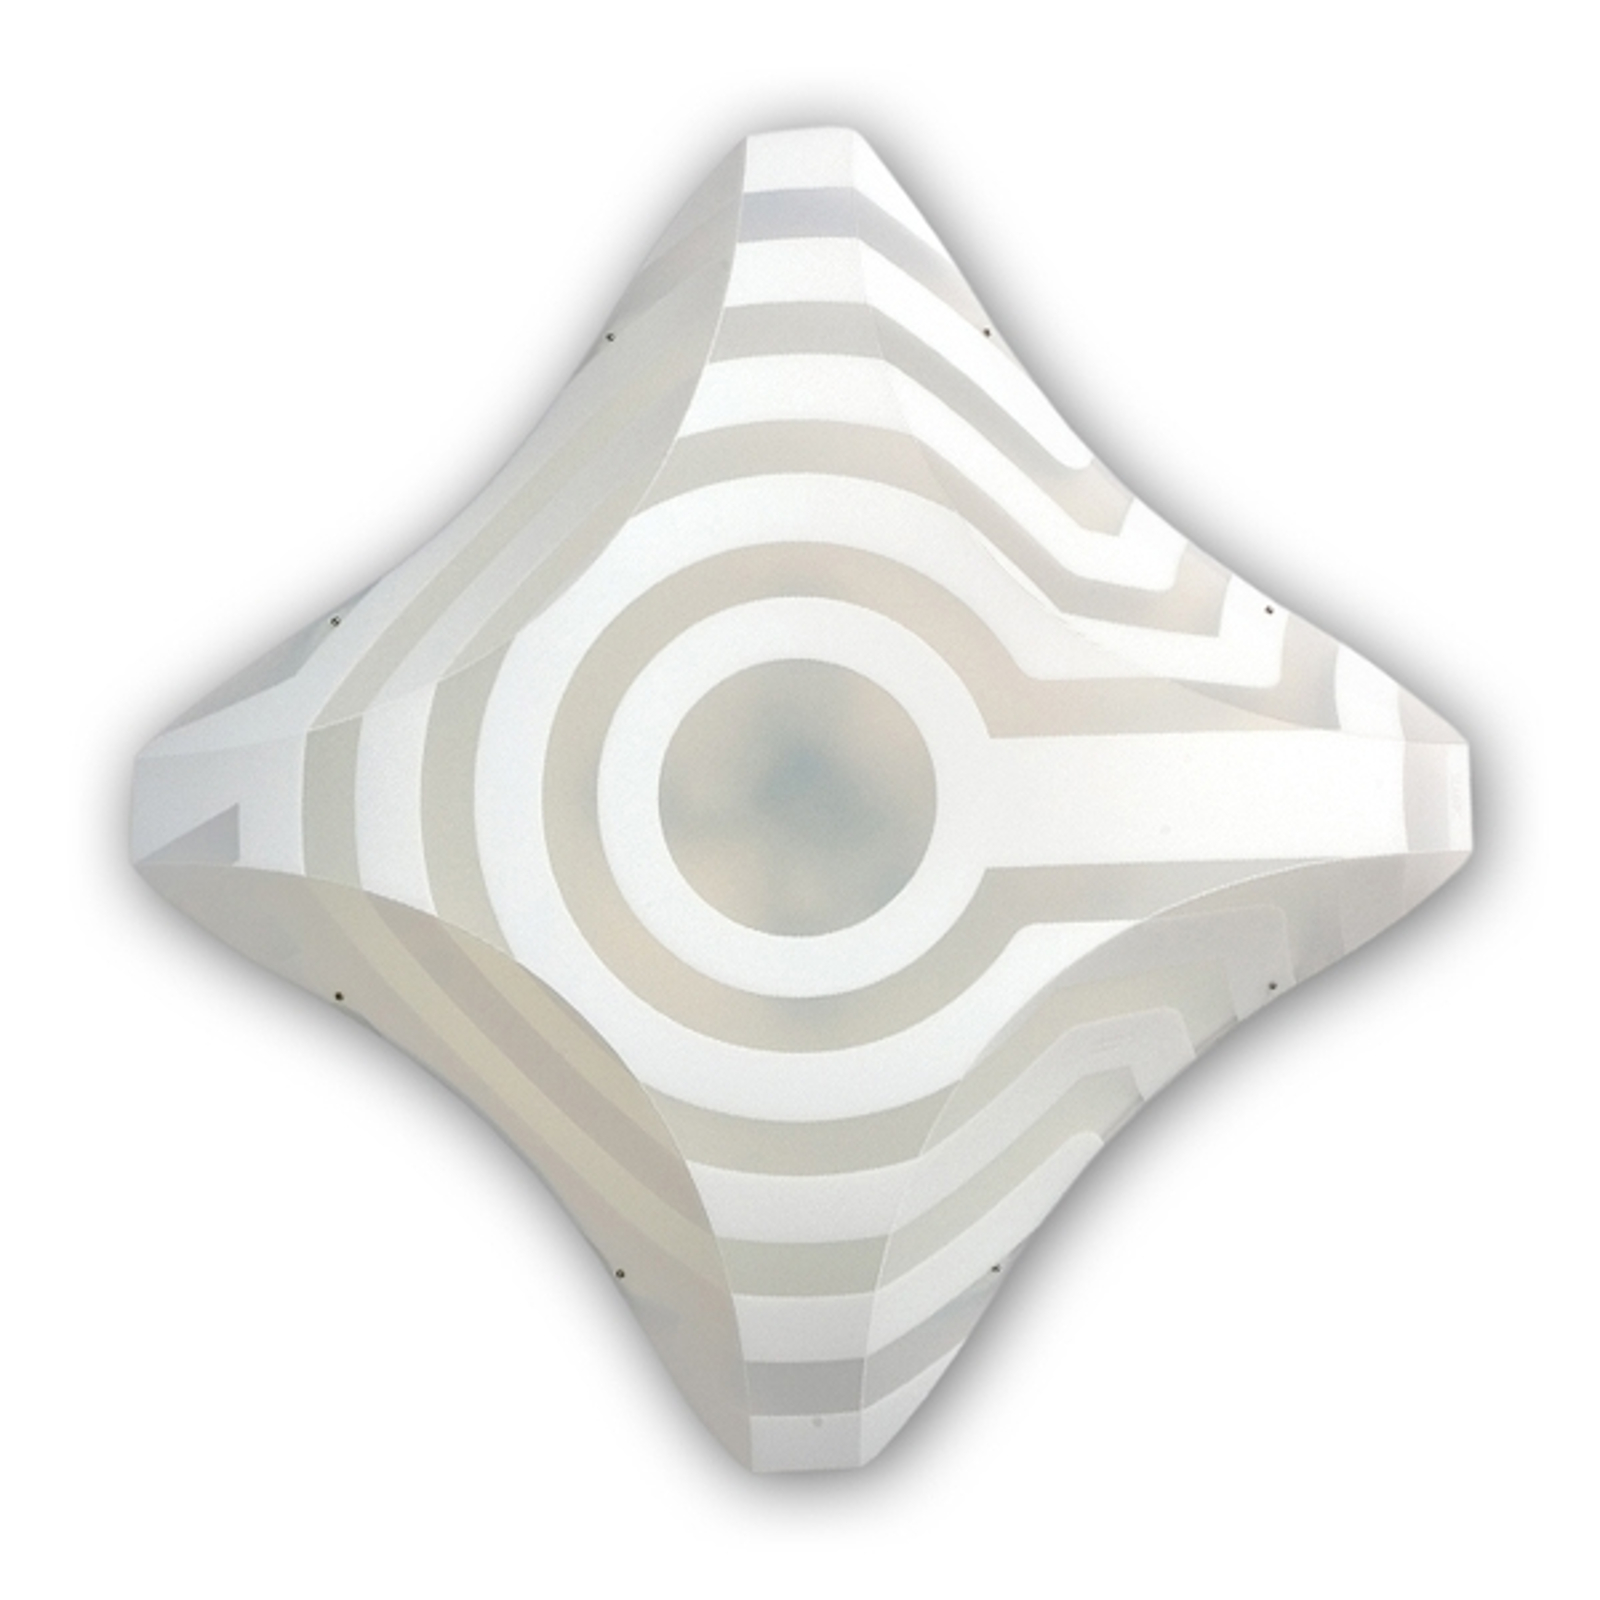 Slamp Venti design plafondlamp, 54x54 cm